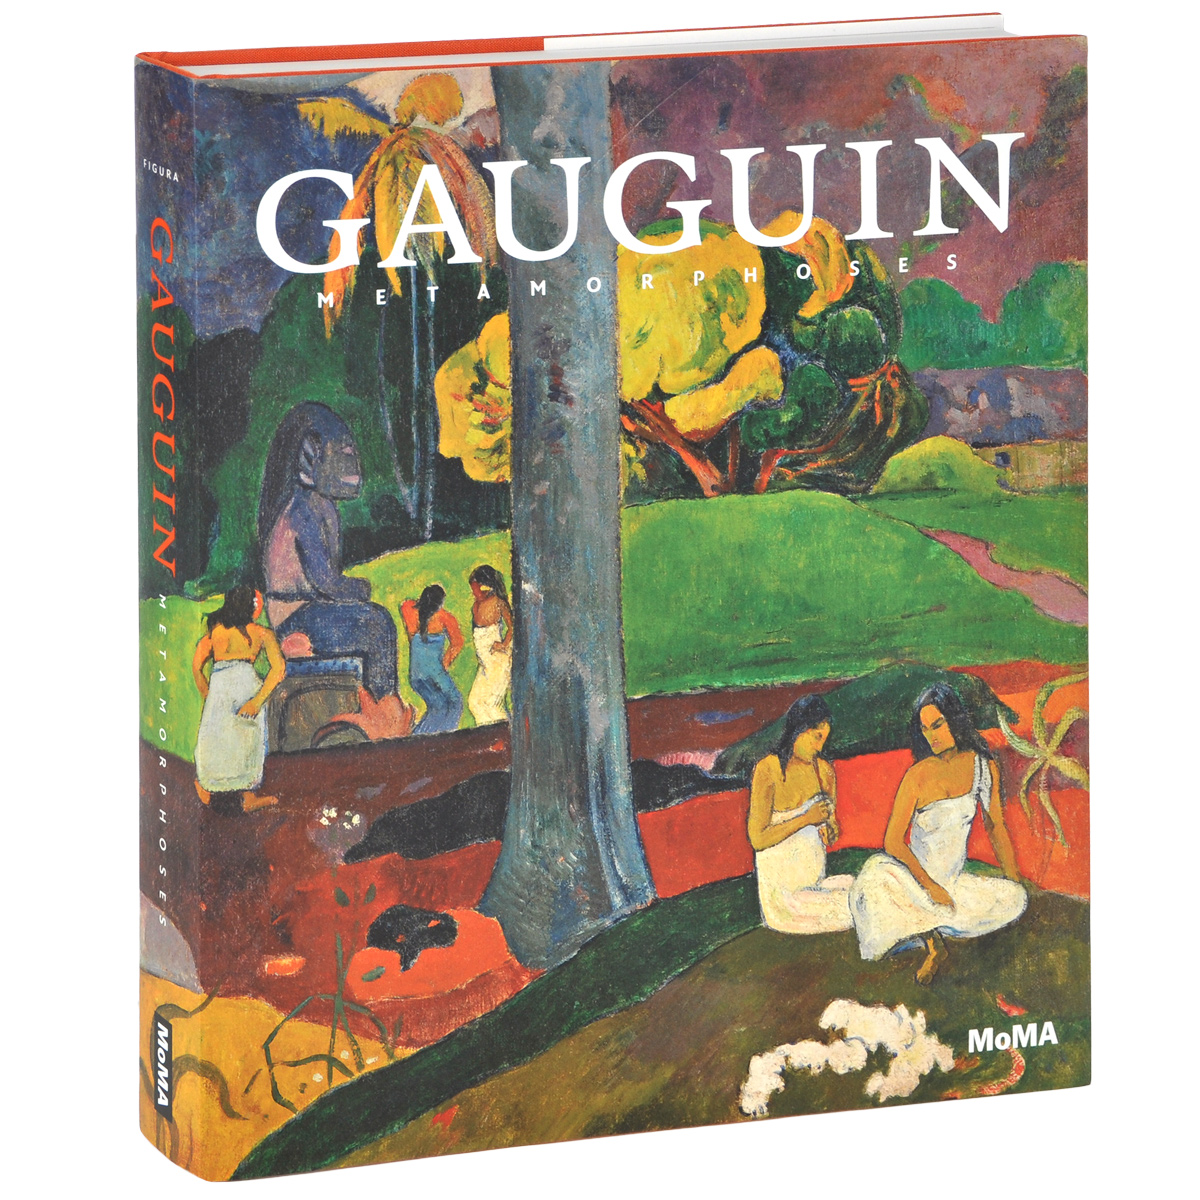 Gauguin: Metamorphoses paul gauguin